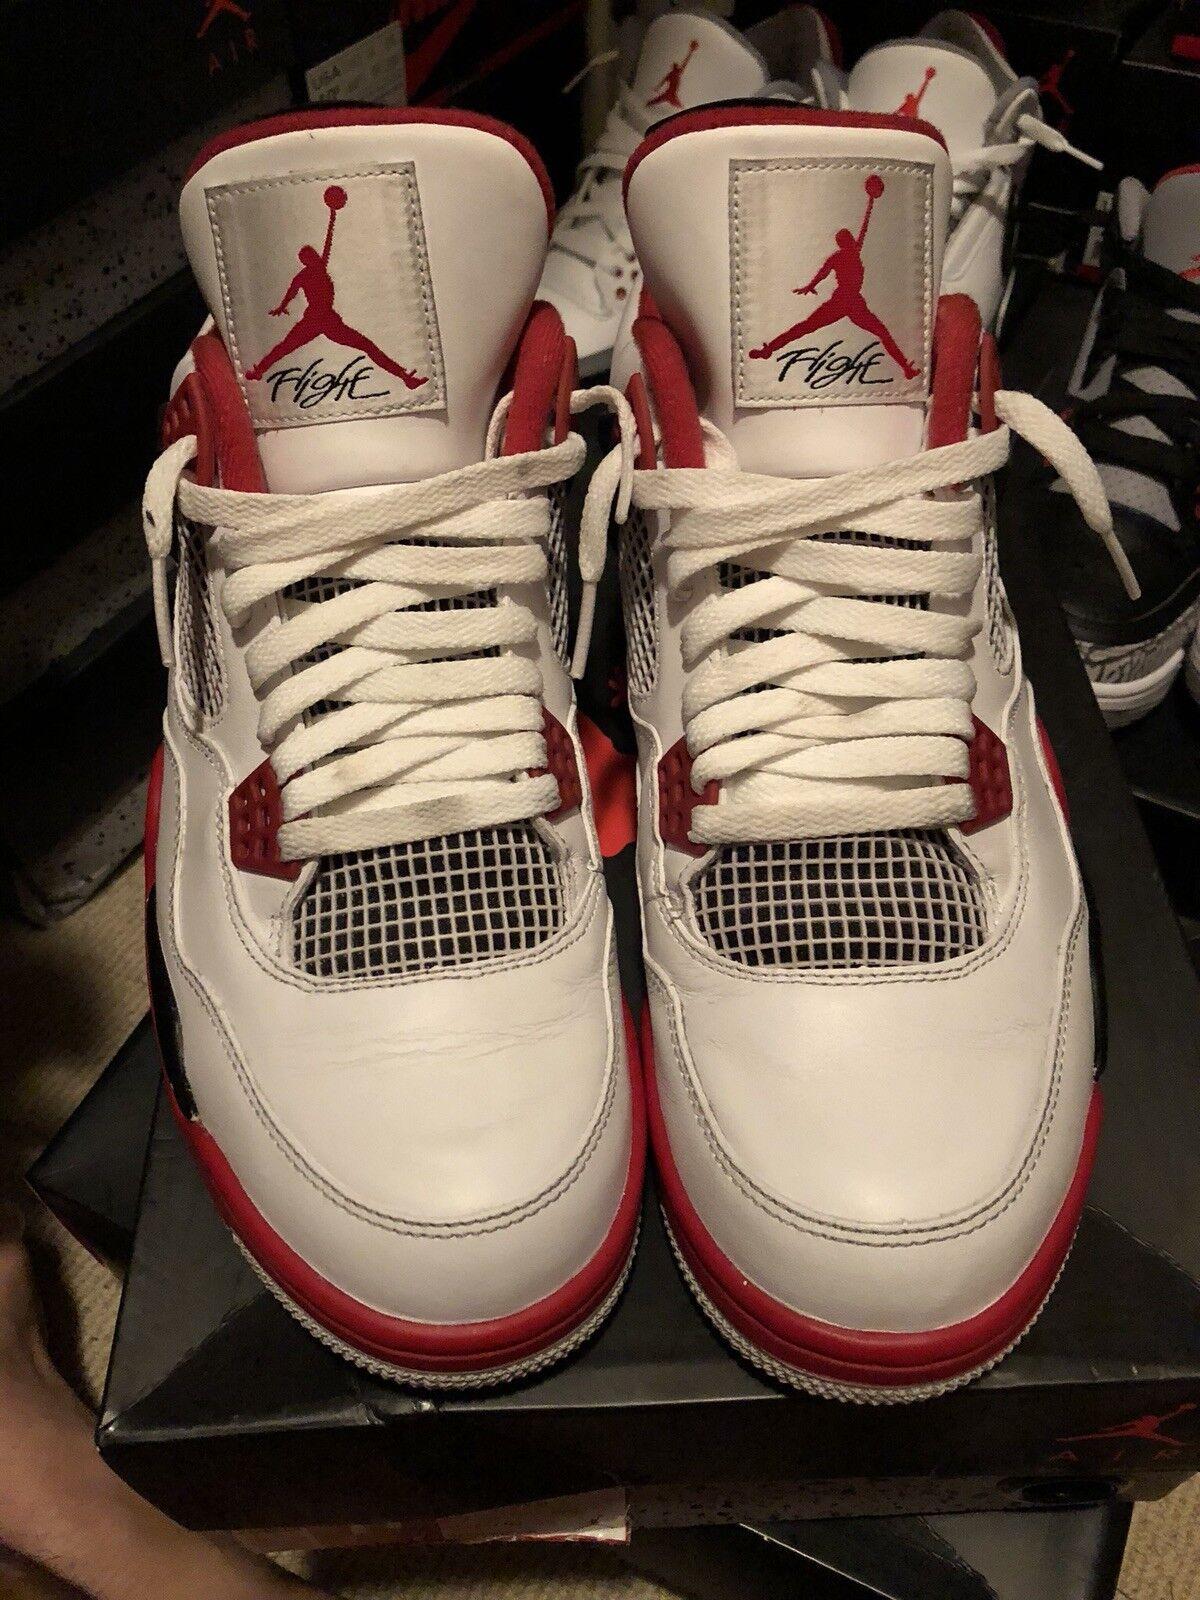 info for 163d7 be844 Air jordan 4 Fire Red Size 11